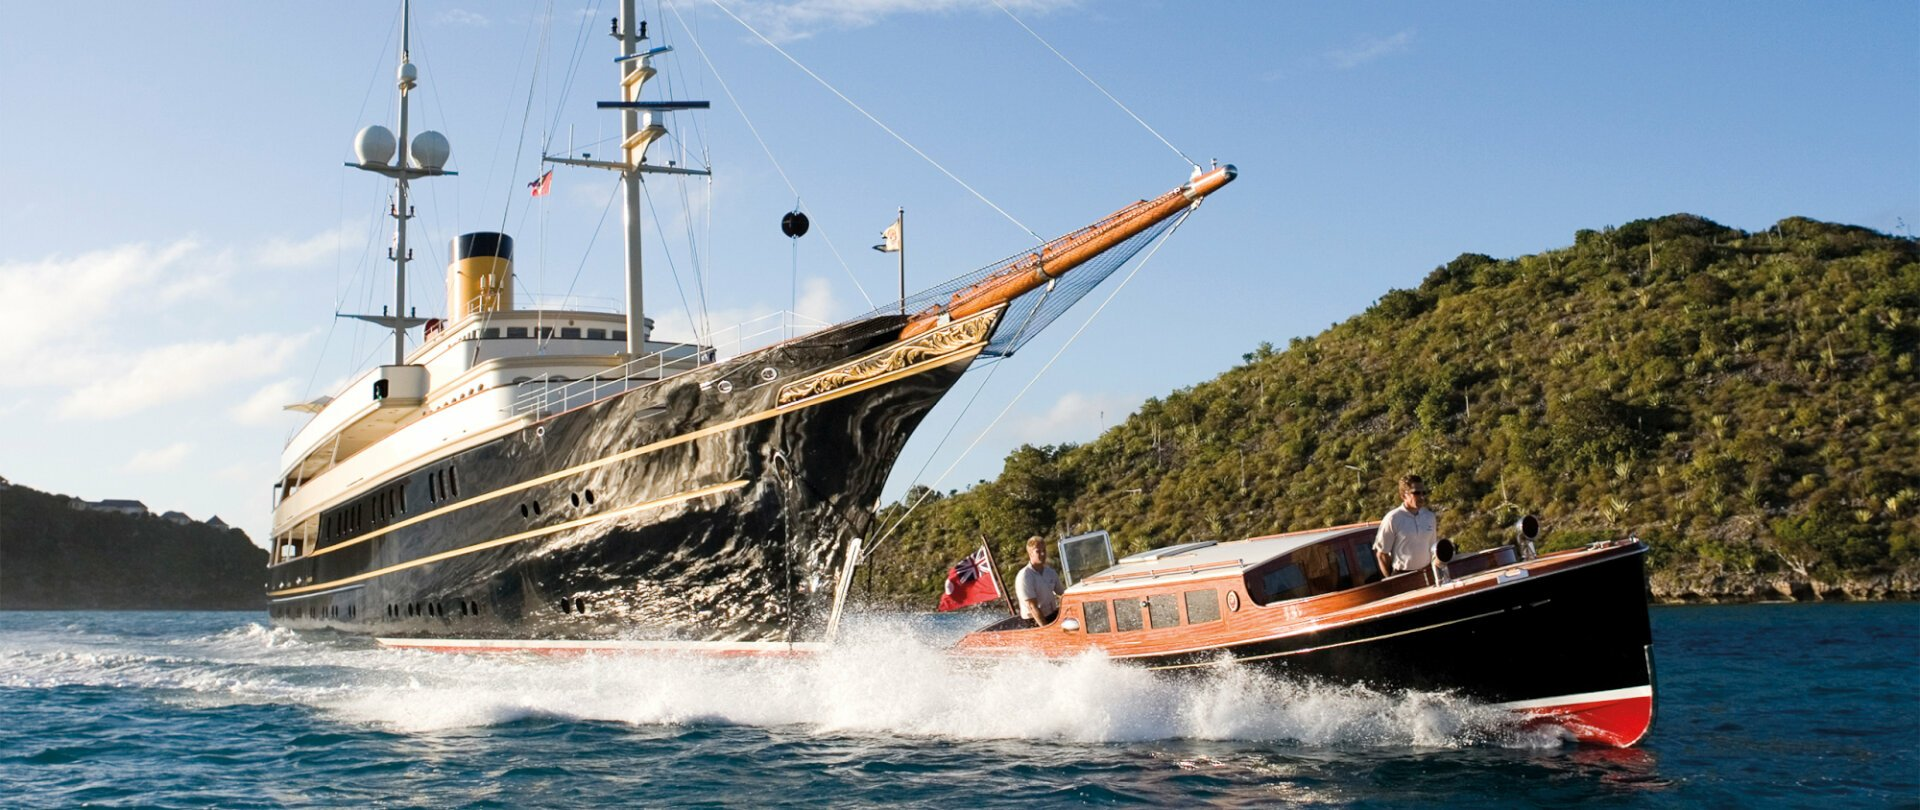 Motor yacht Nero sailing past Islands